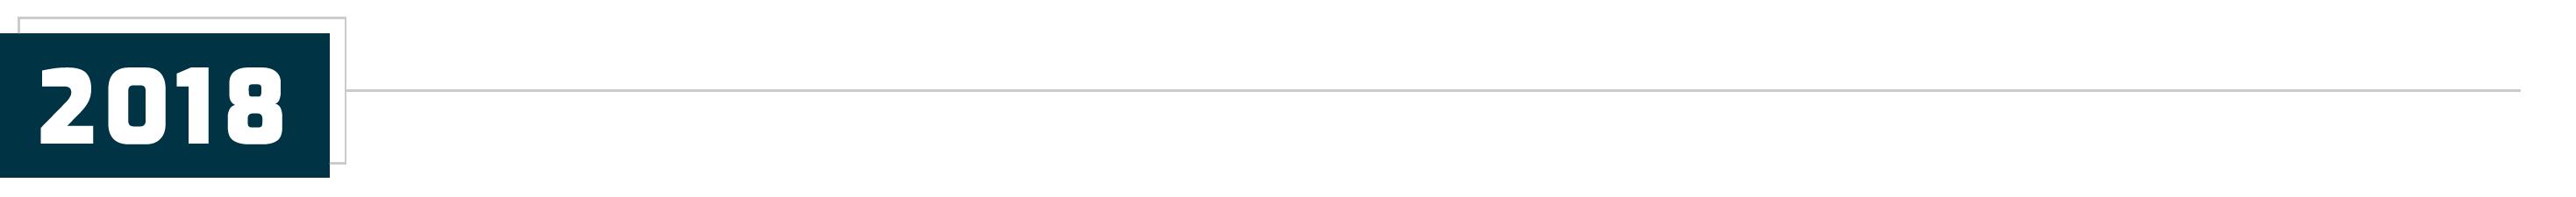 Choice Bank Timeline 2018